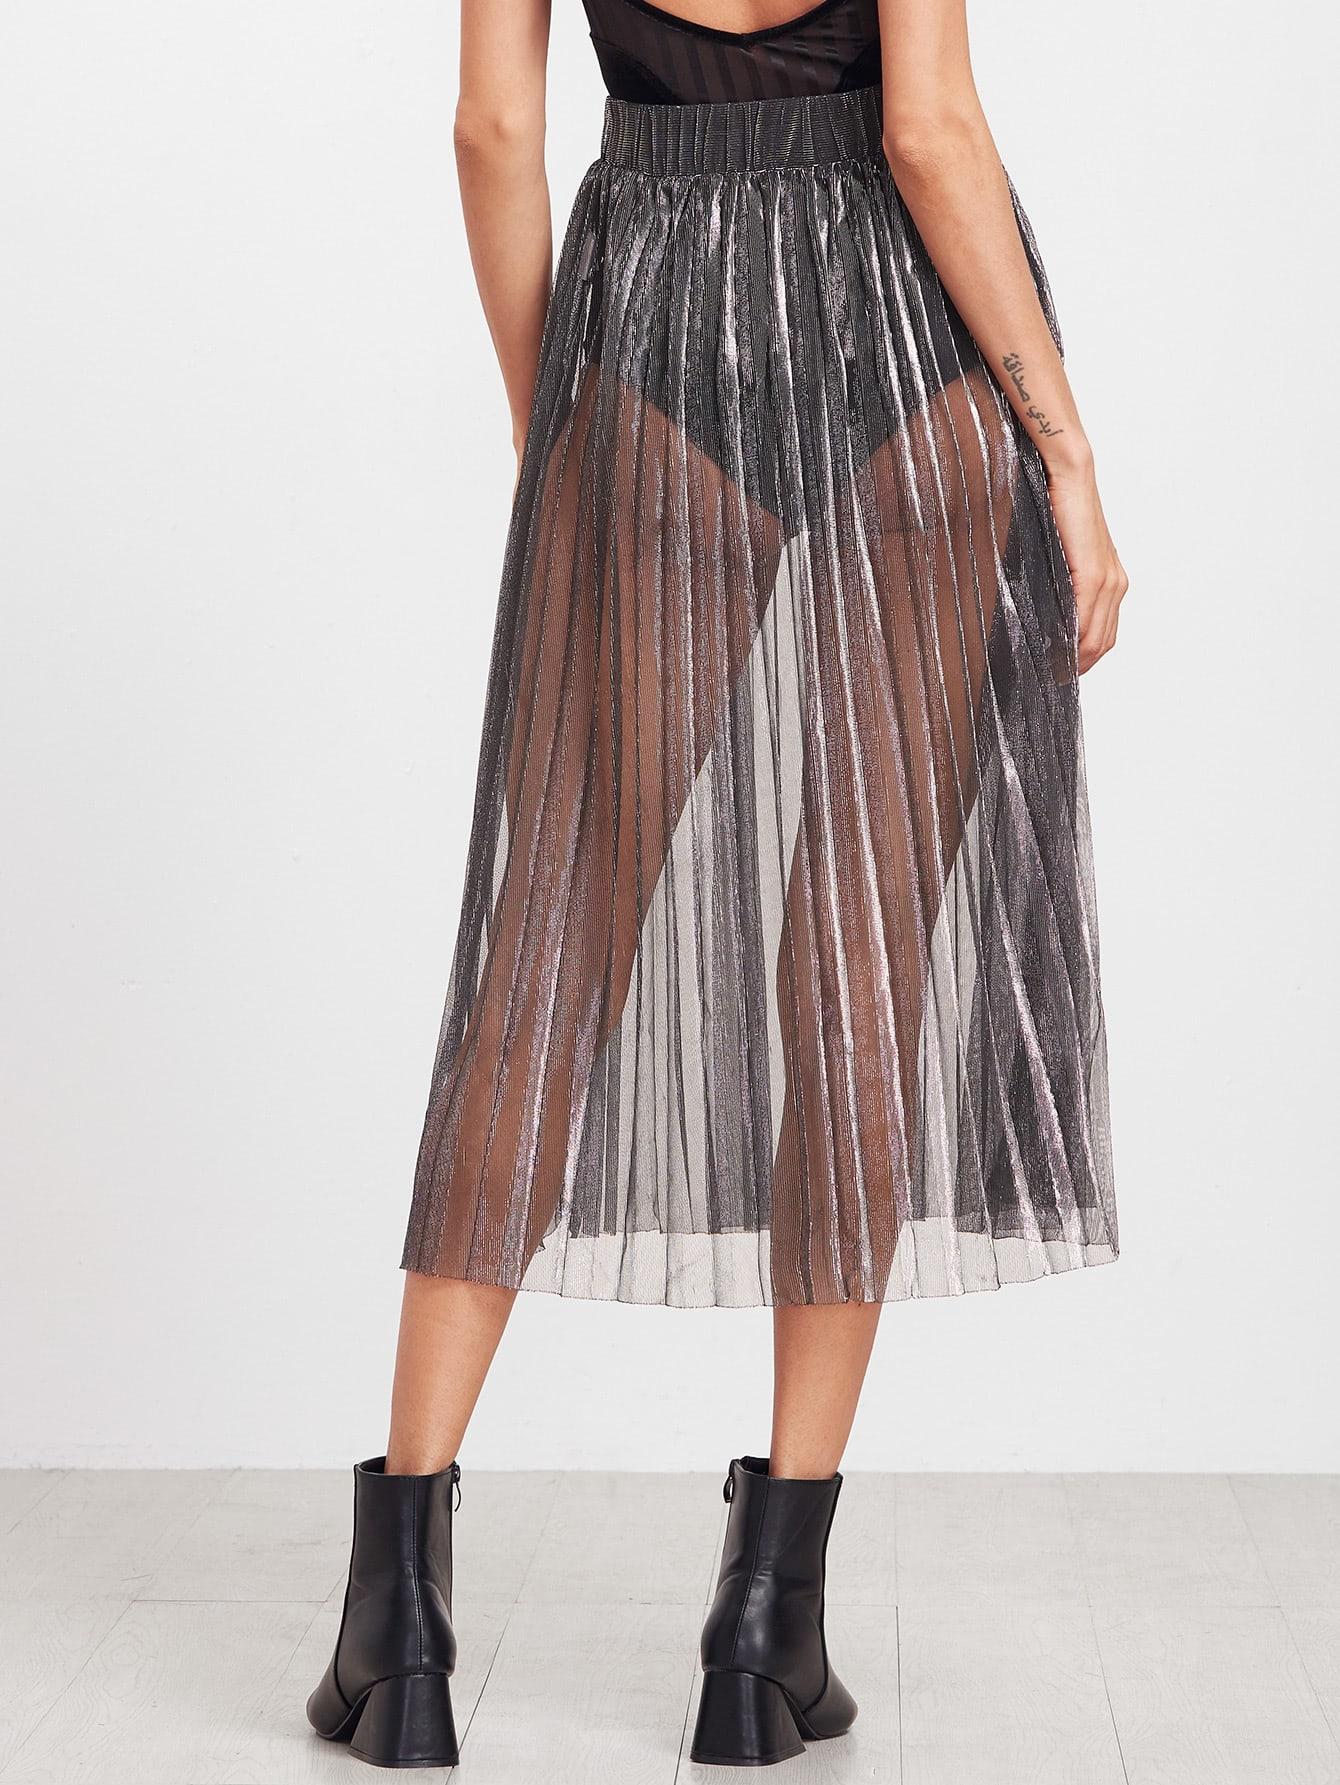 sheer see through pleated skirt shein sheinside